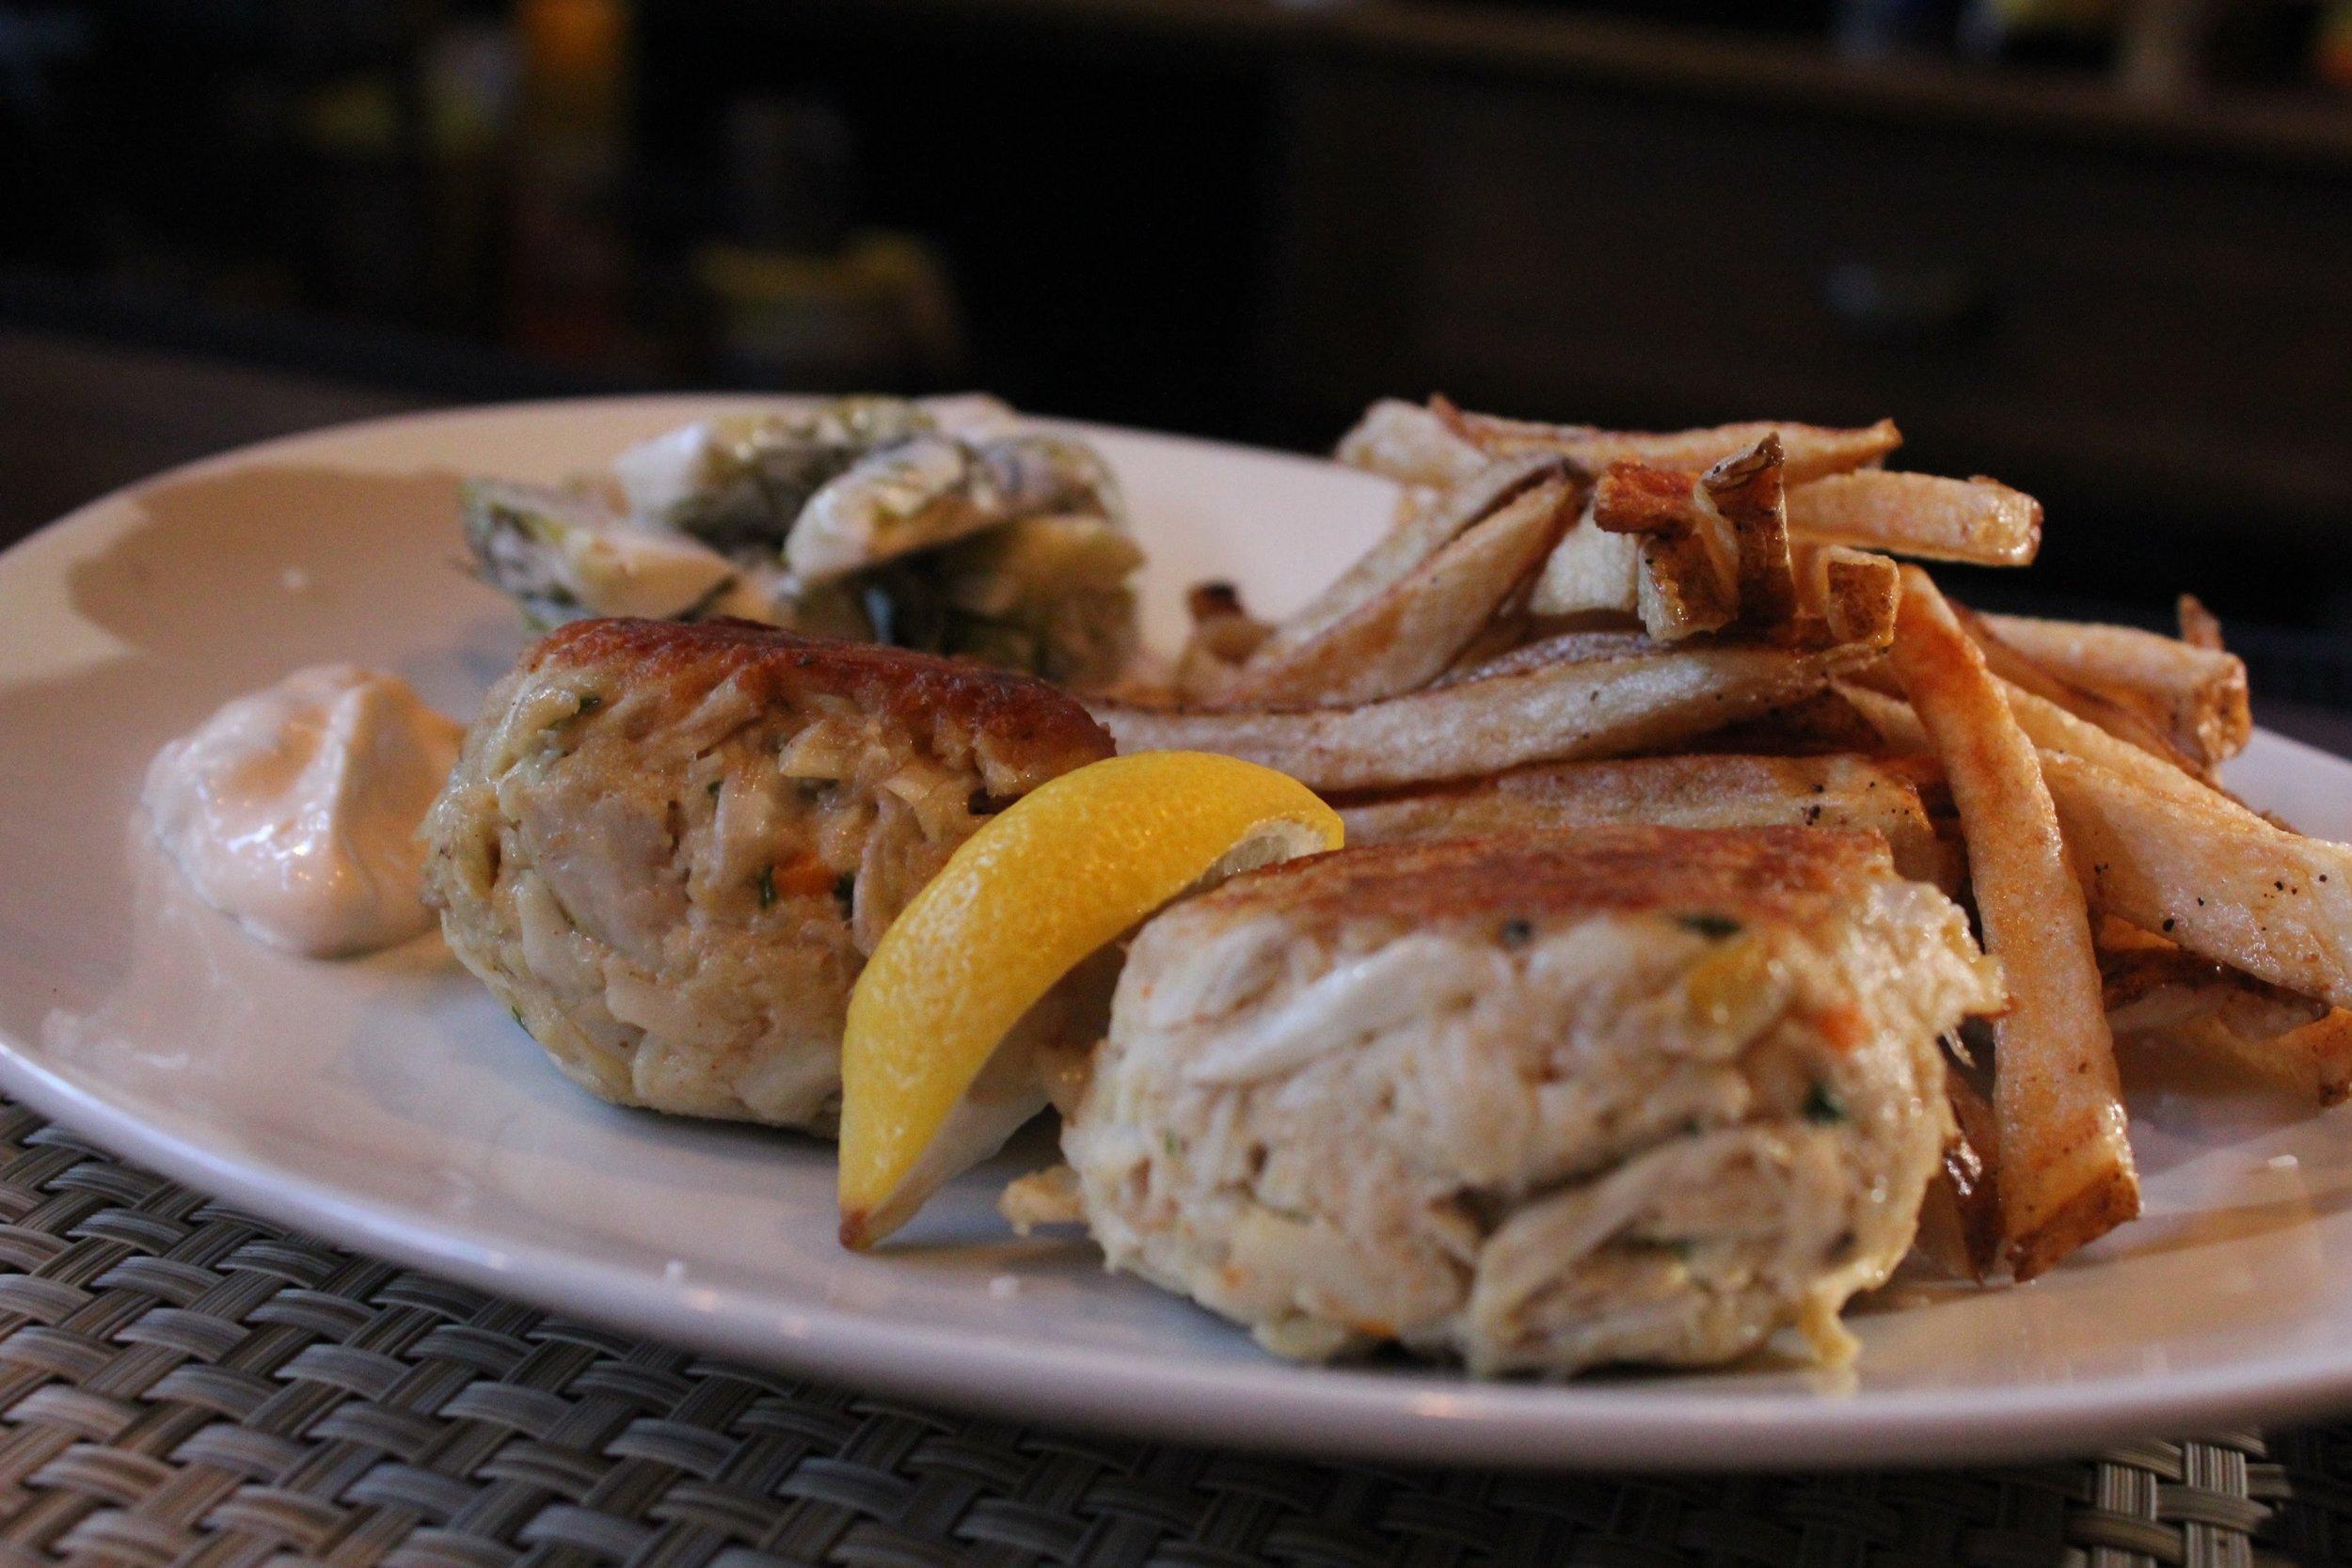 Pier Point (https://www.pierpointrestaurant.com) Chef Nancy Longo's Smoked and Standard Crab Cakes